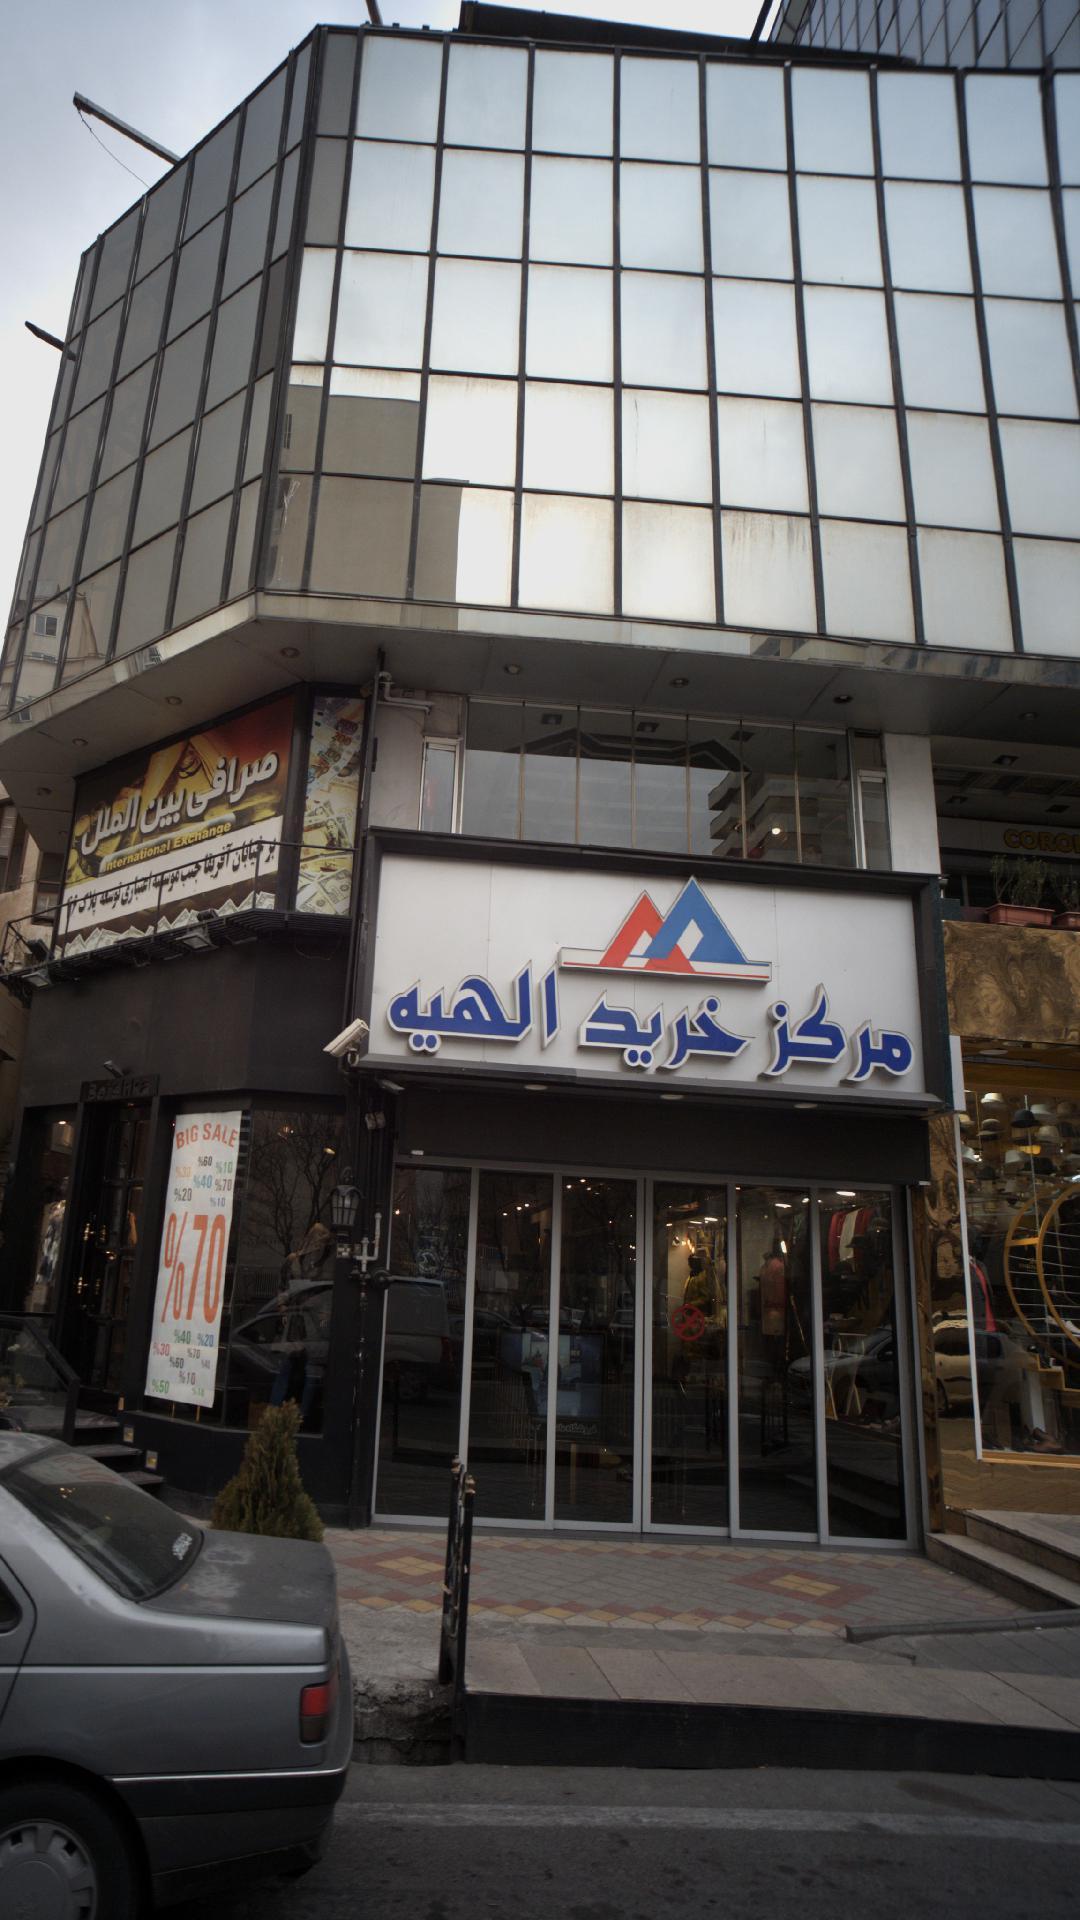 مرکز خرید الهیه